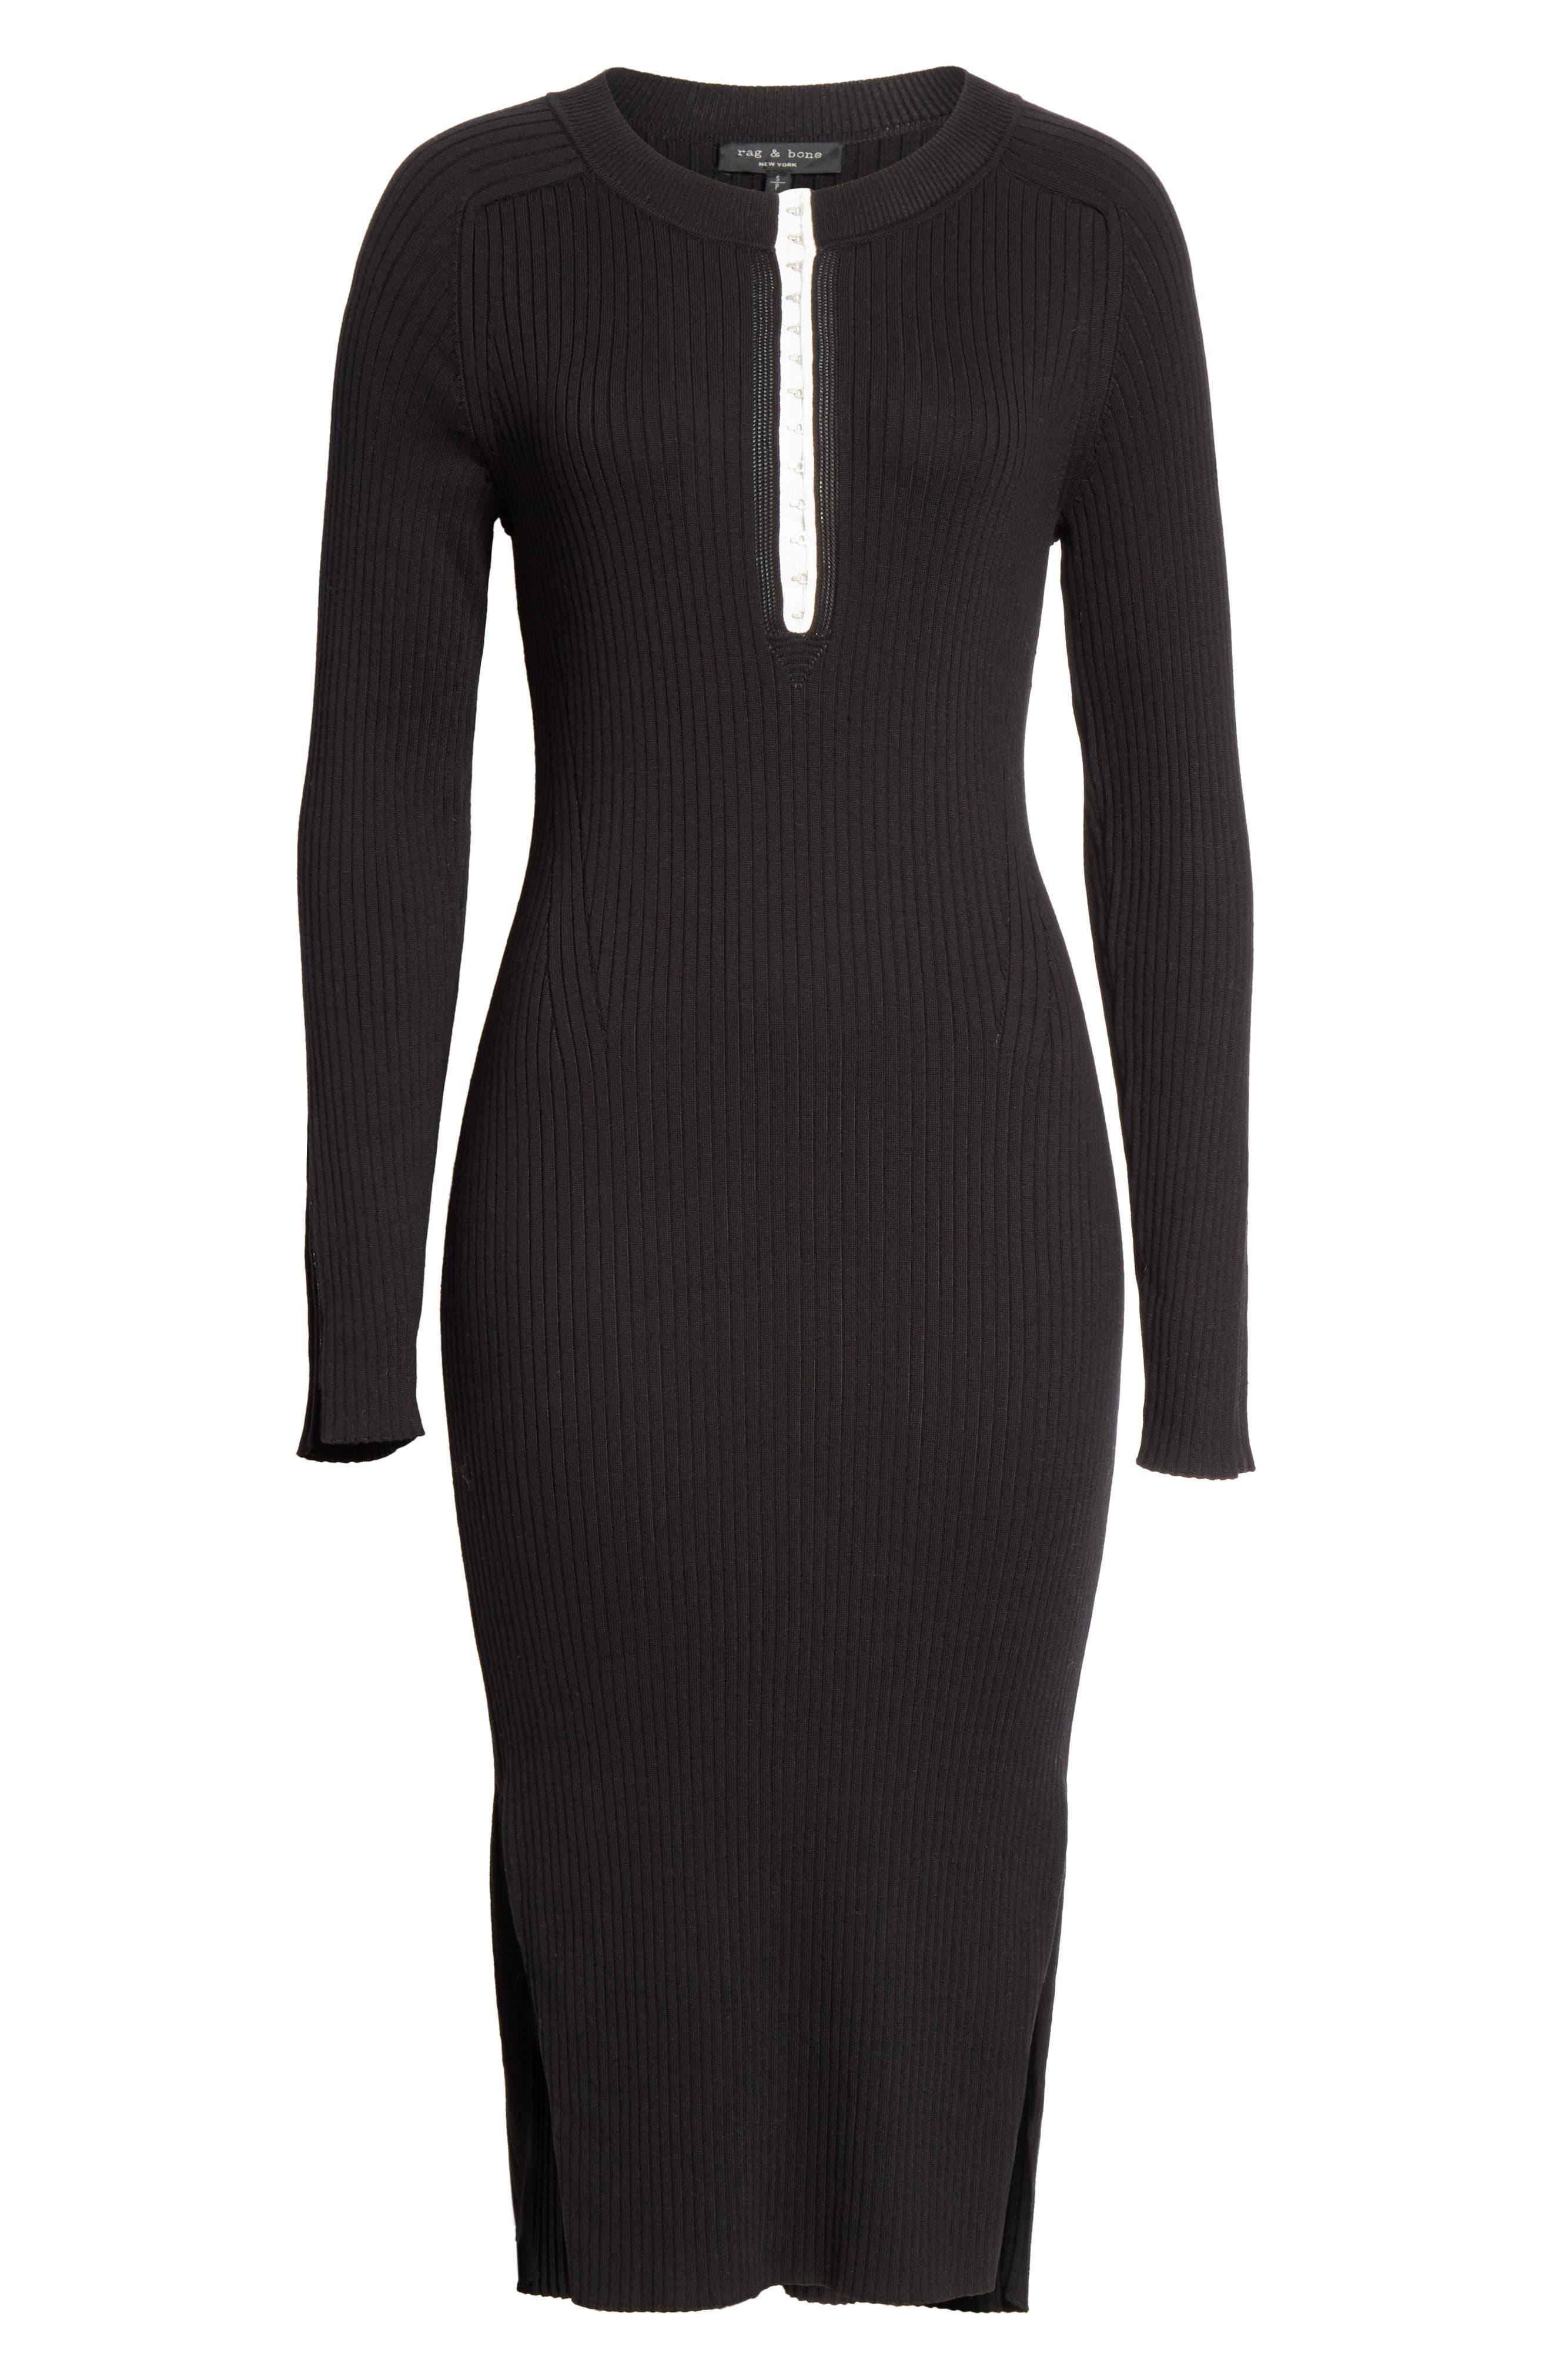 RAG & BONE,                             Brynn Rib Knit Dress,                             Alternate thumbnail 7, color,                             BLACK